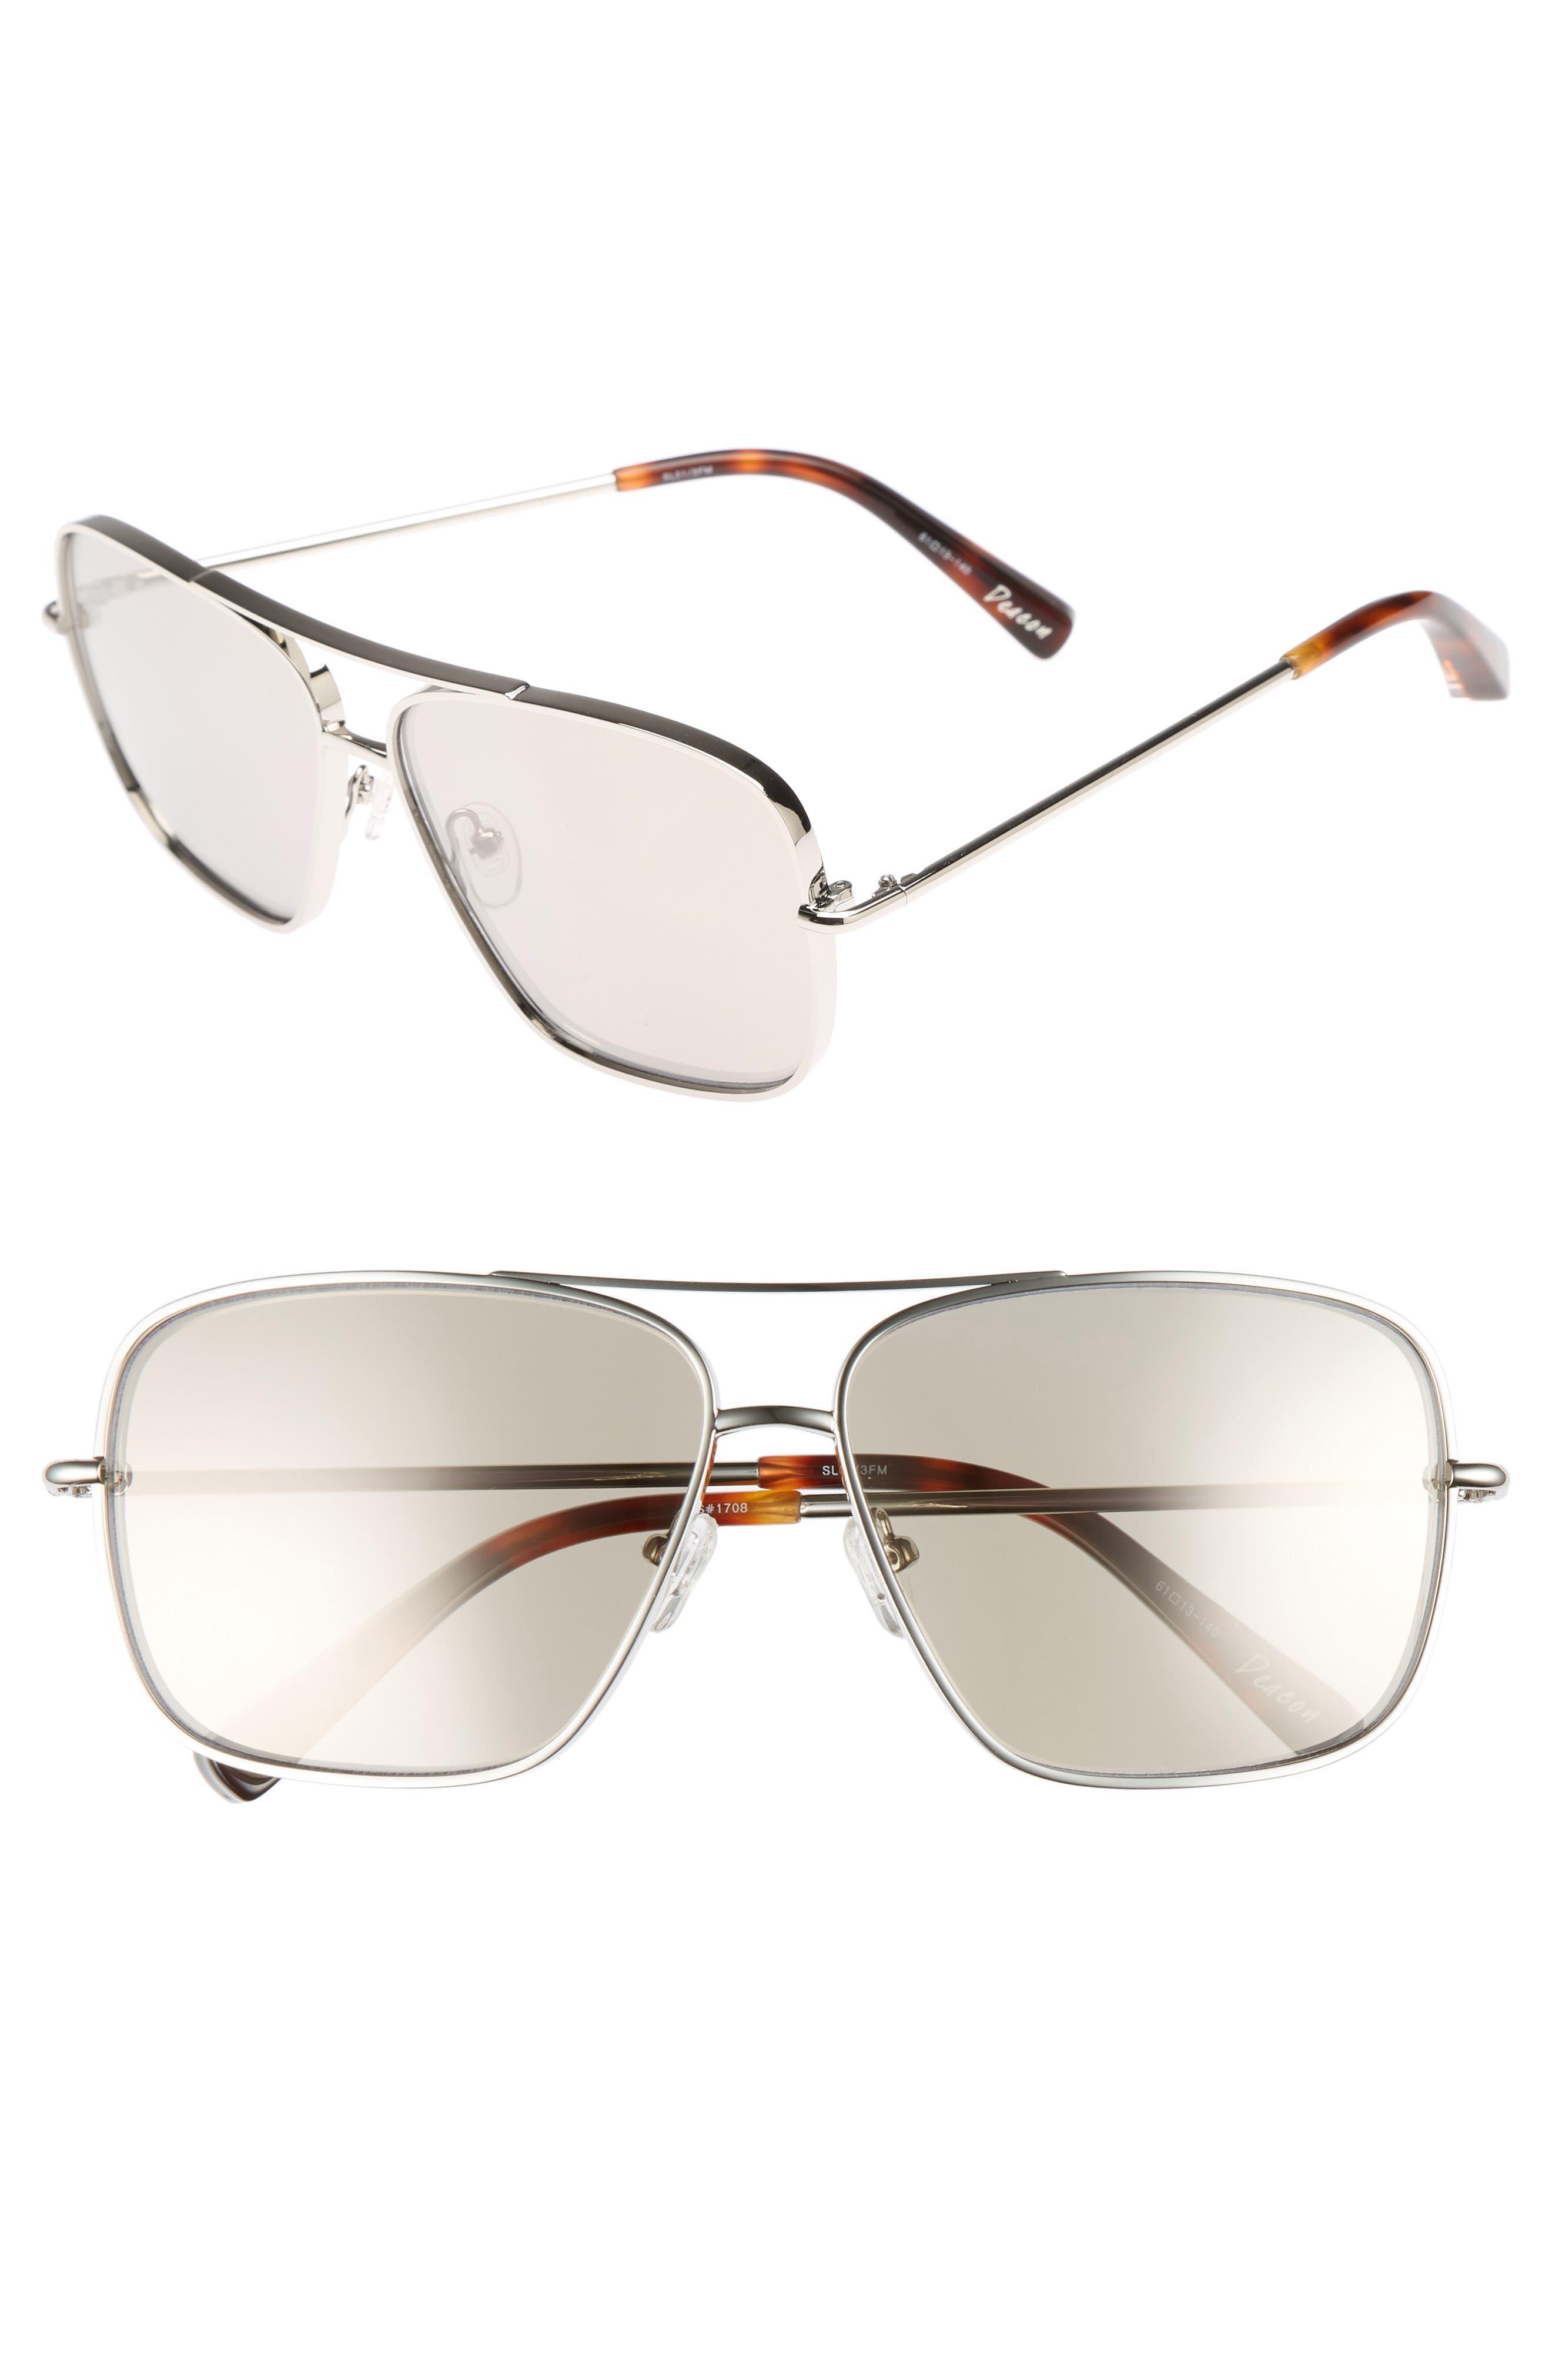 Deacon 61mm Aviator Sunglasses,                             Main thumbnail 1, color,                             040